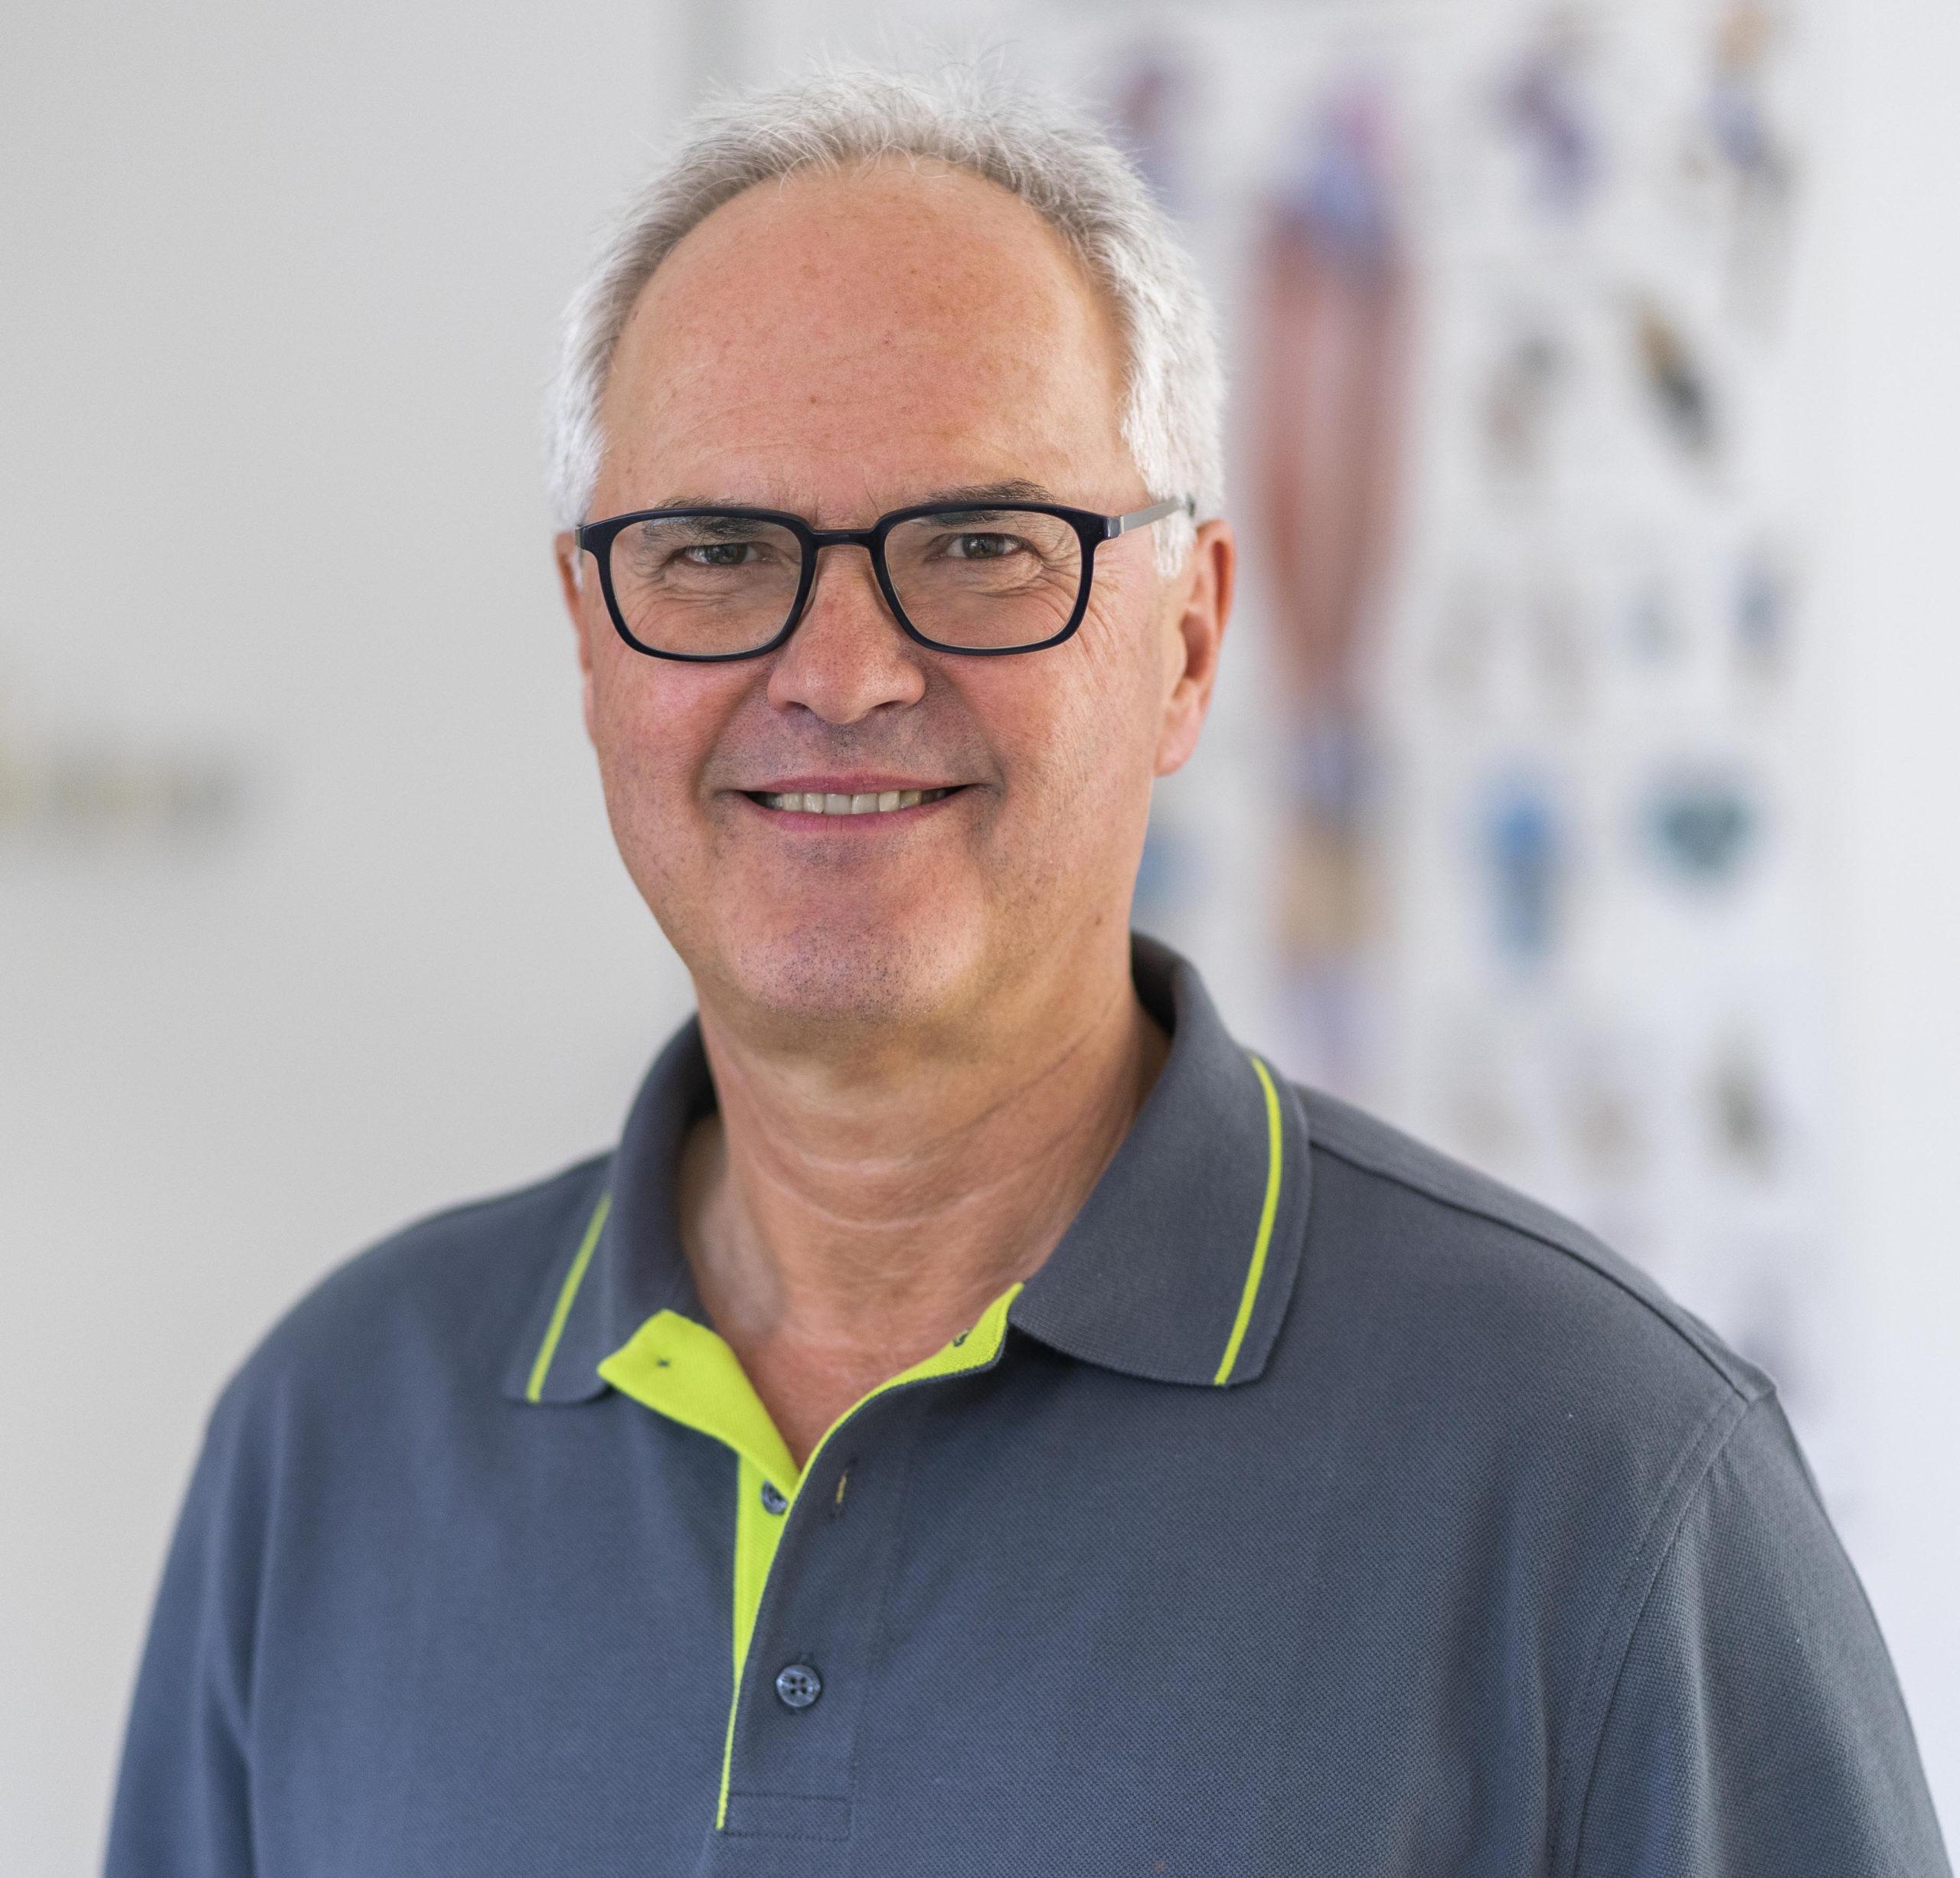 Dr. med. Michael Diepolder